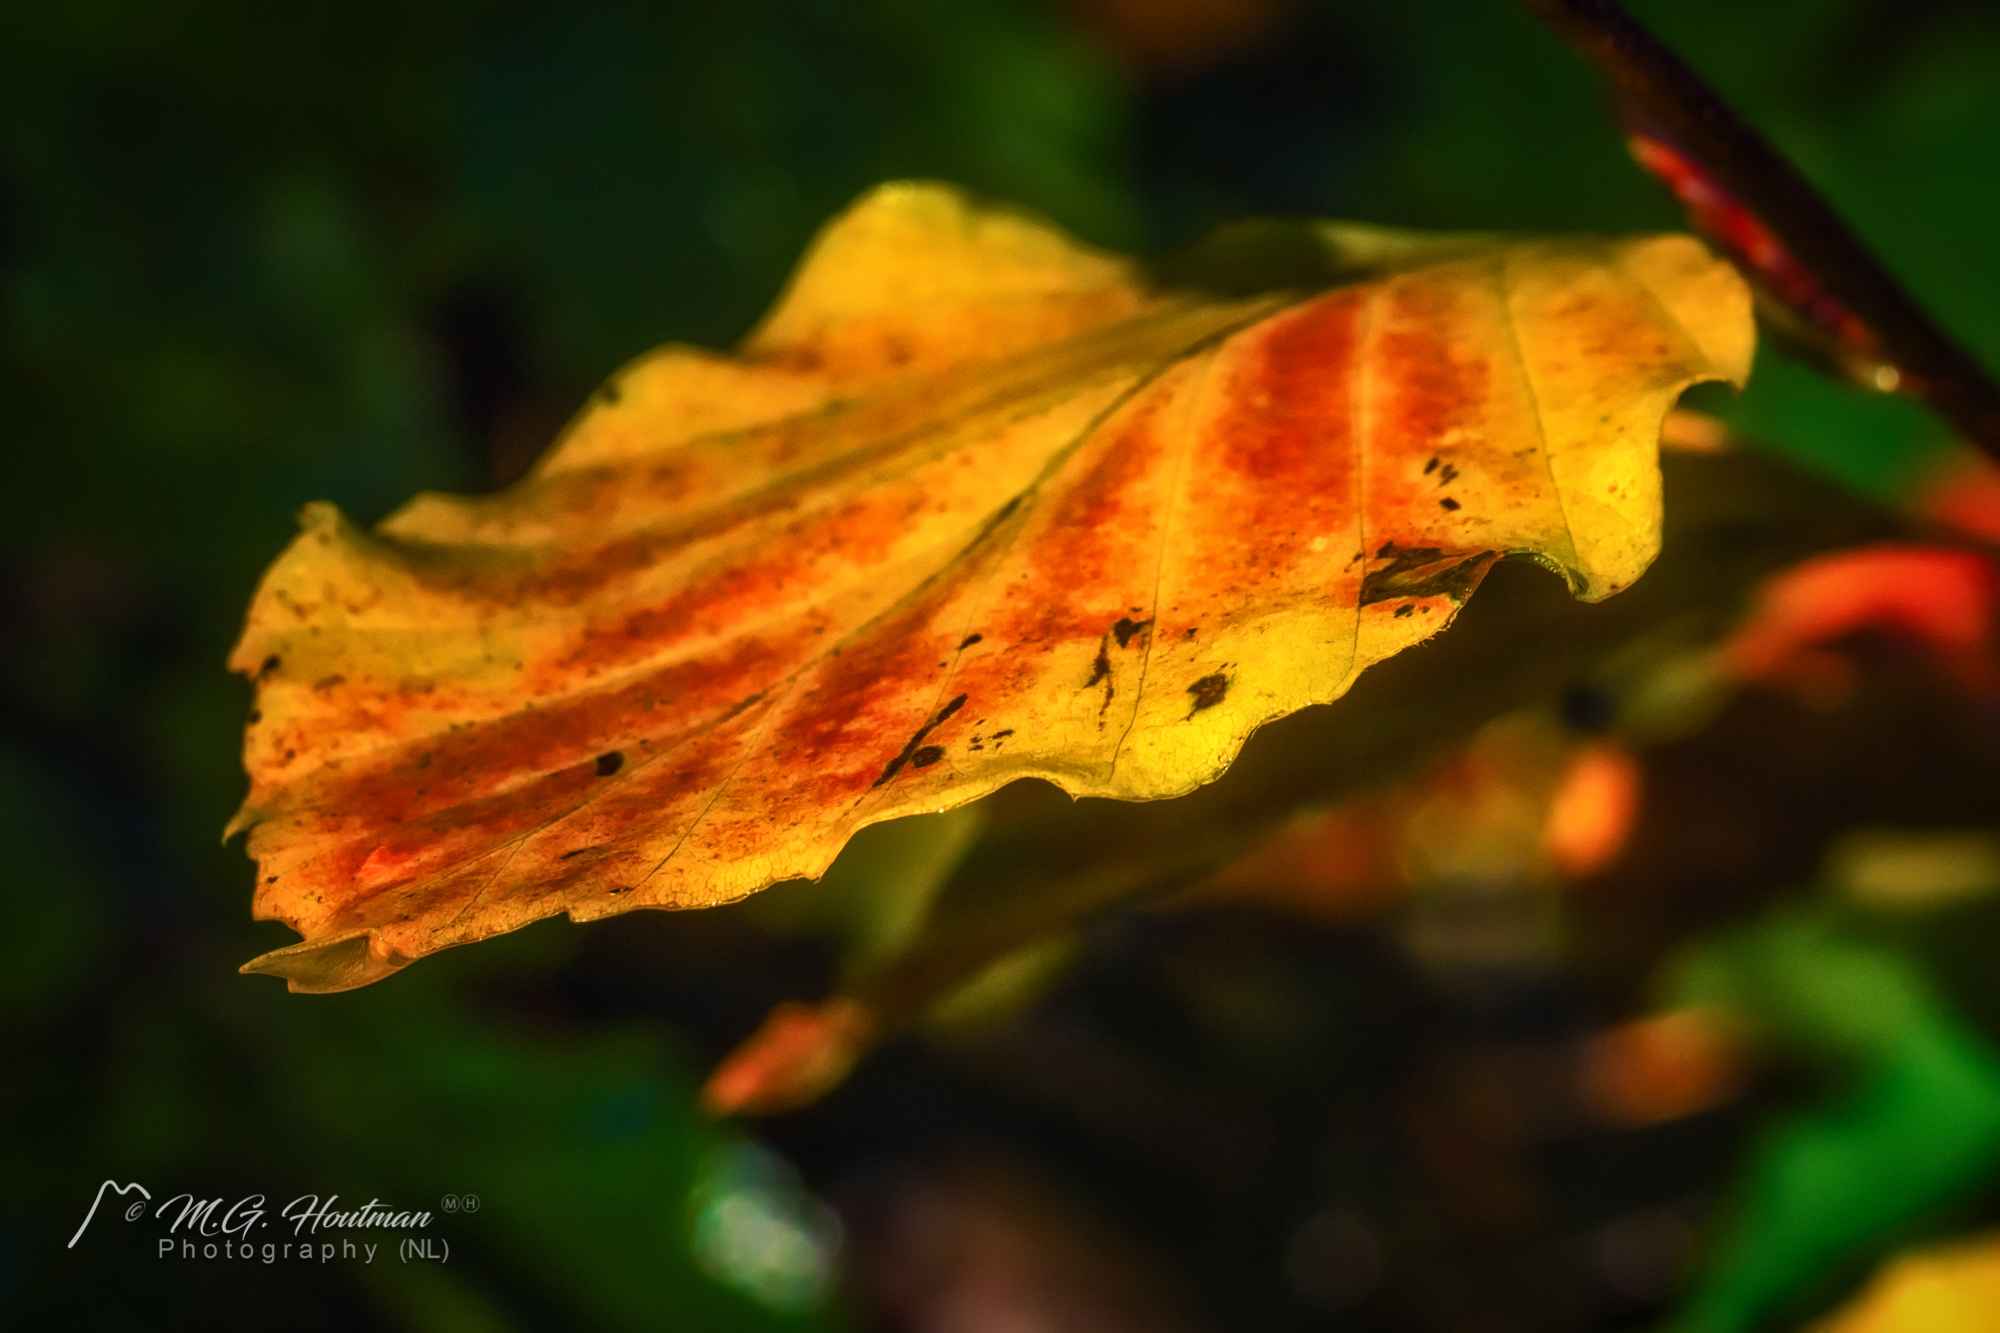 Leave the leaf